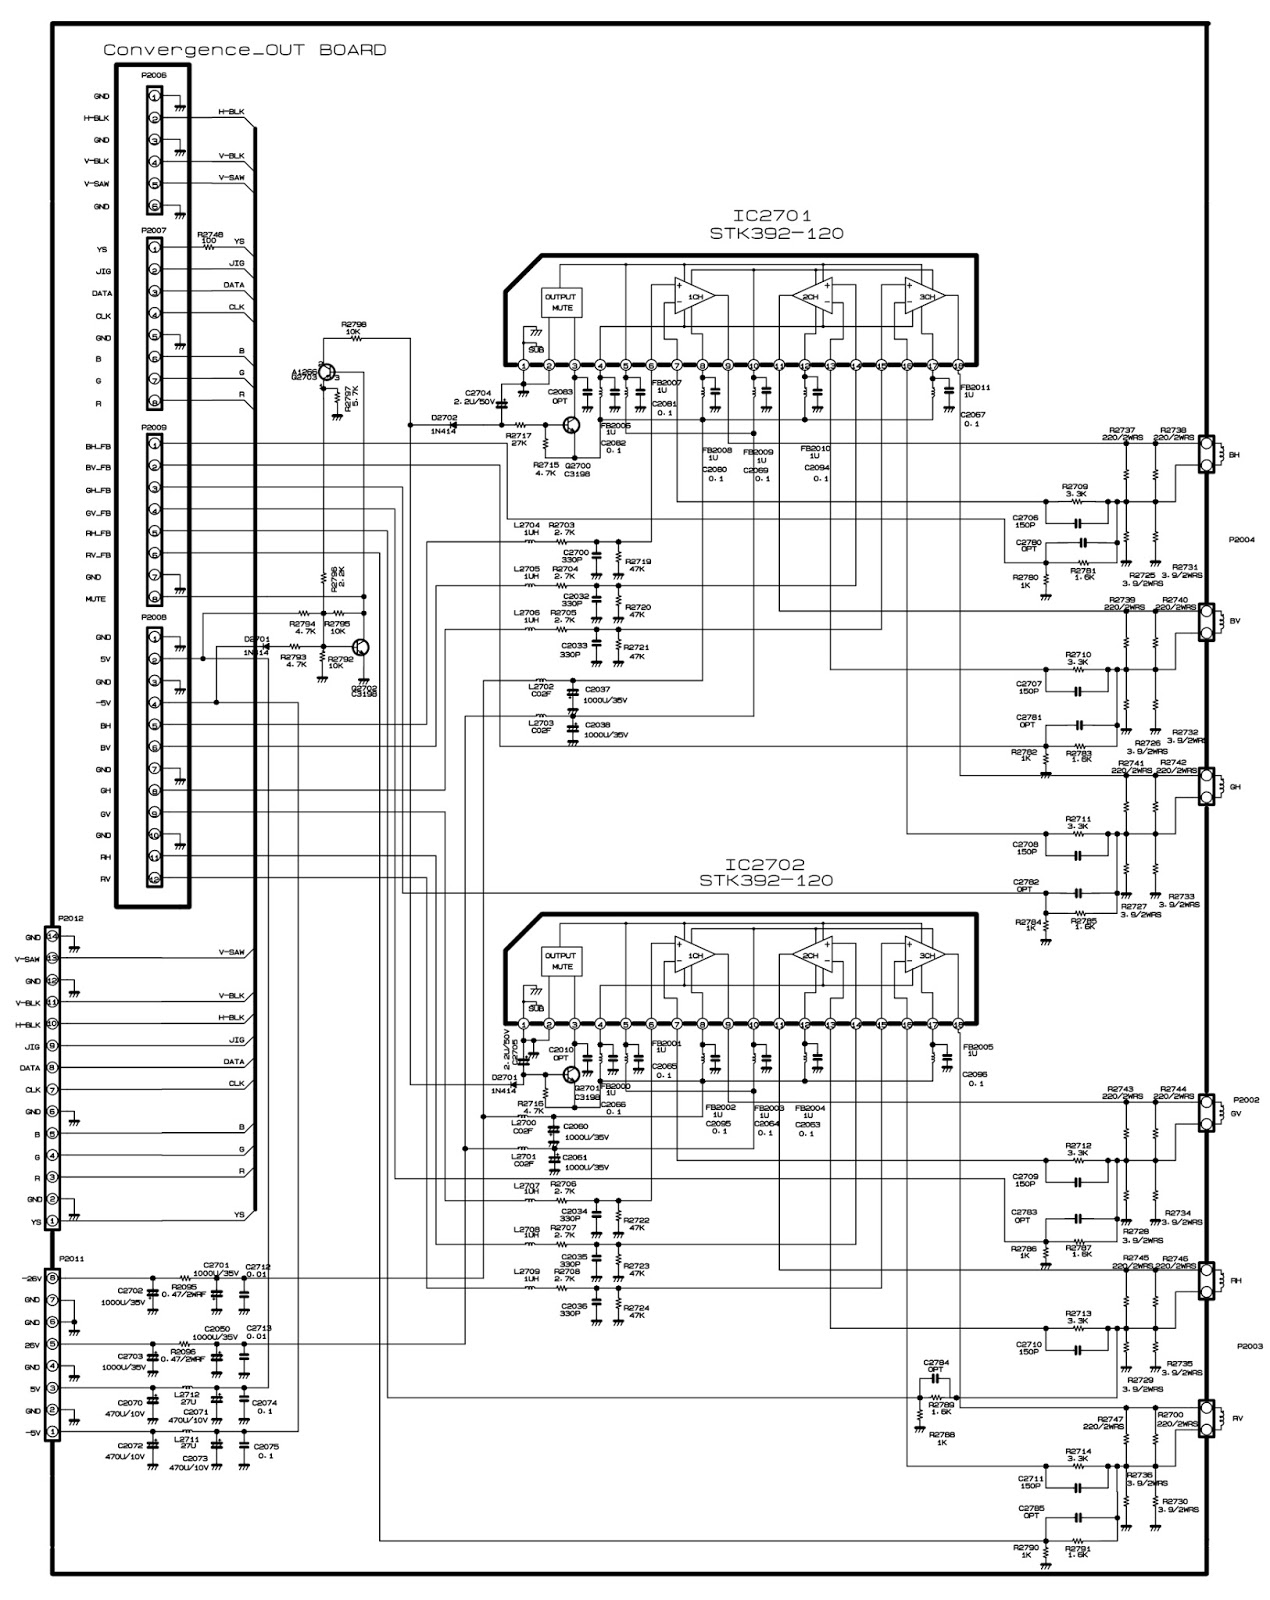 RPTV - LG RE39NZ43 – LG RL39NZ43 – Convergence